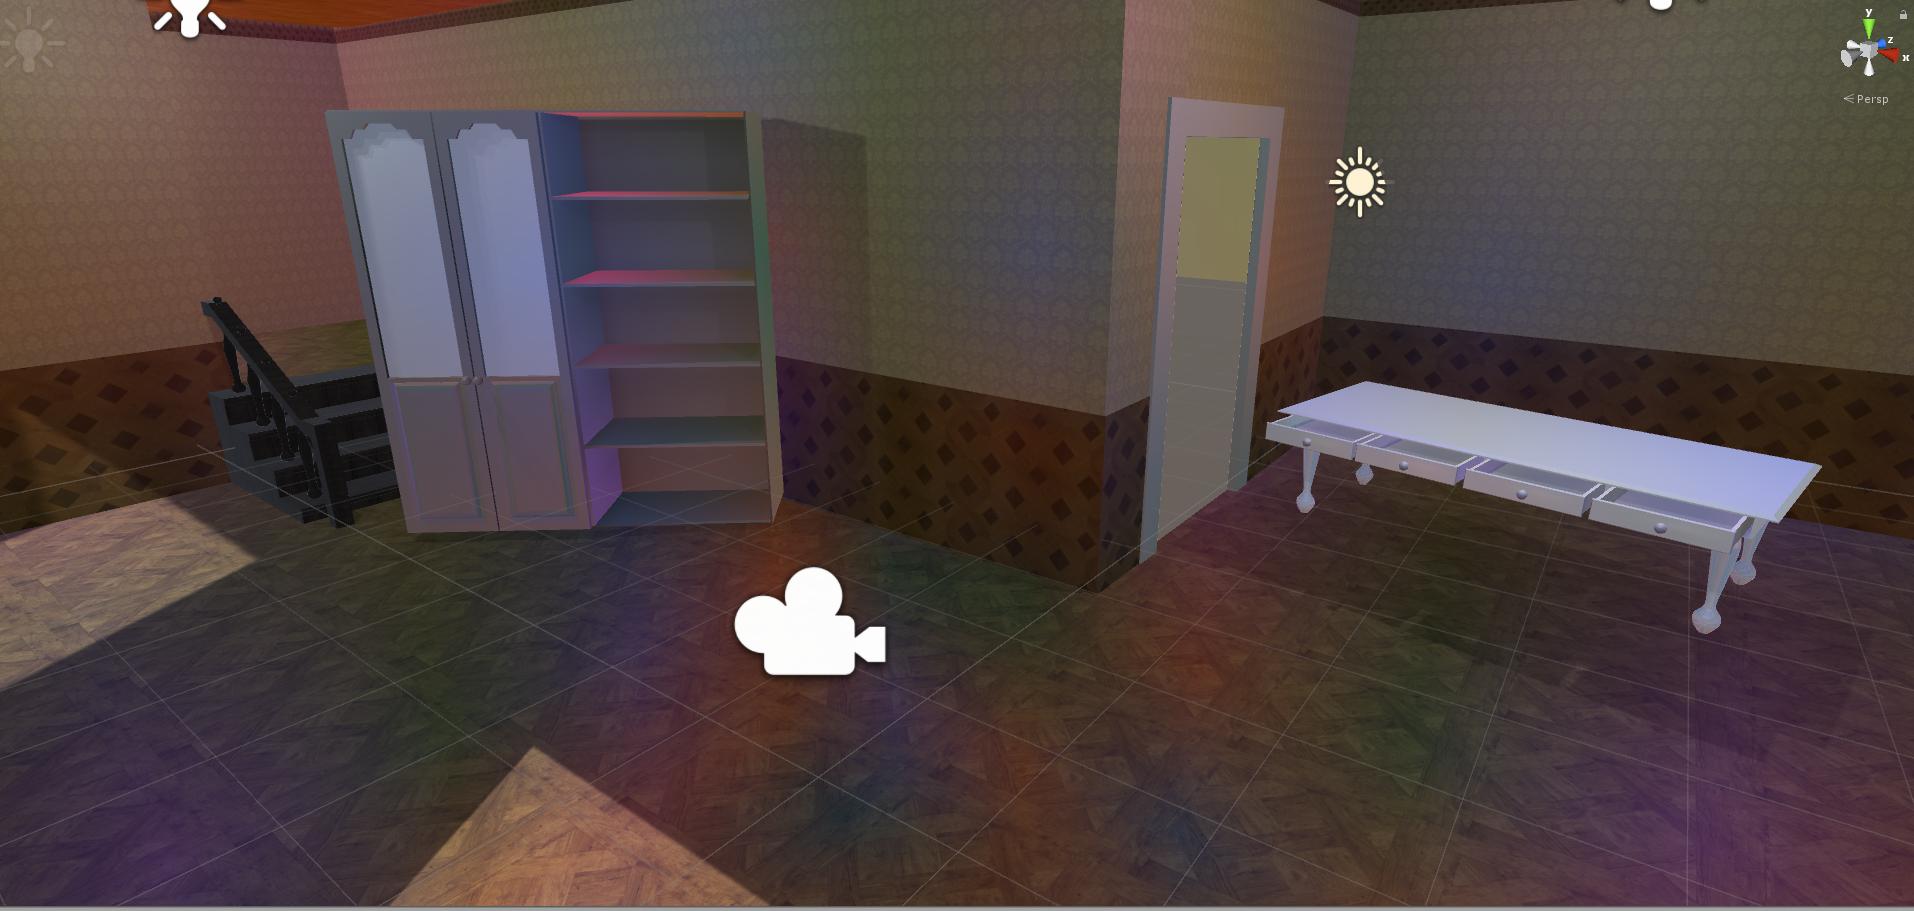 room environment